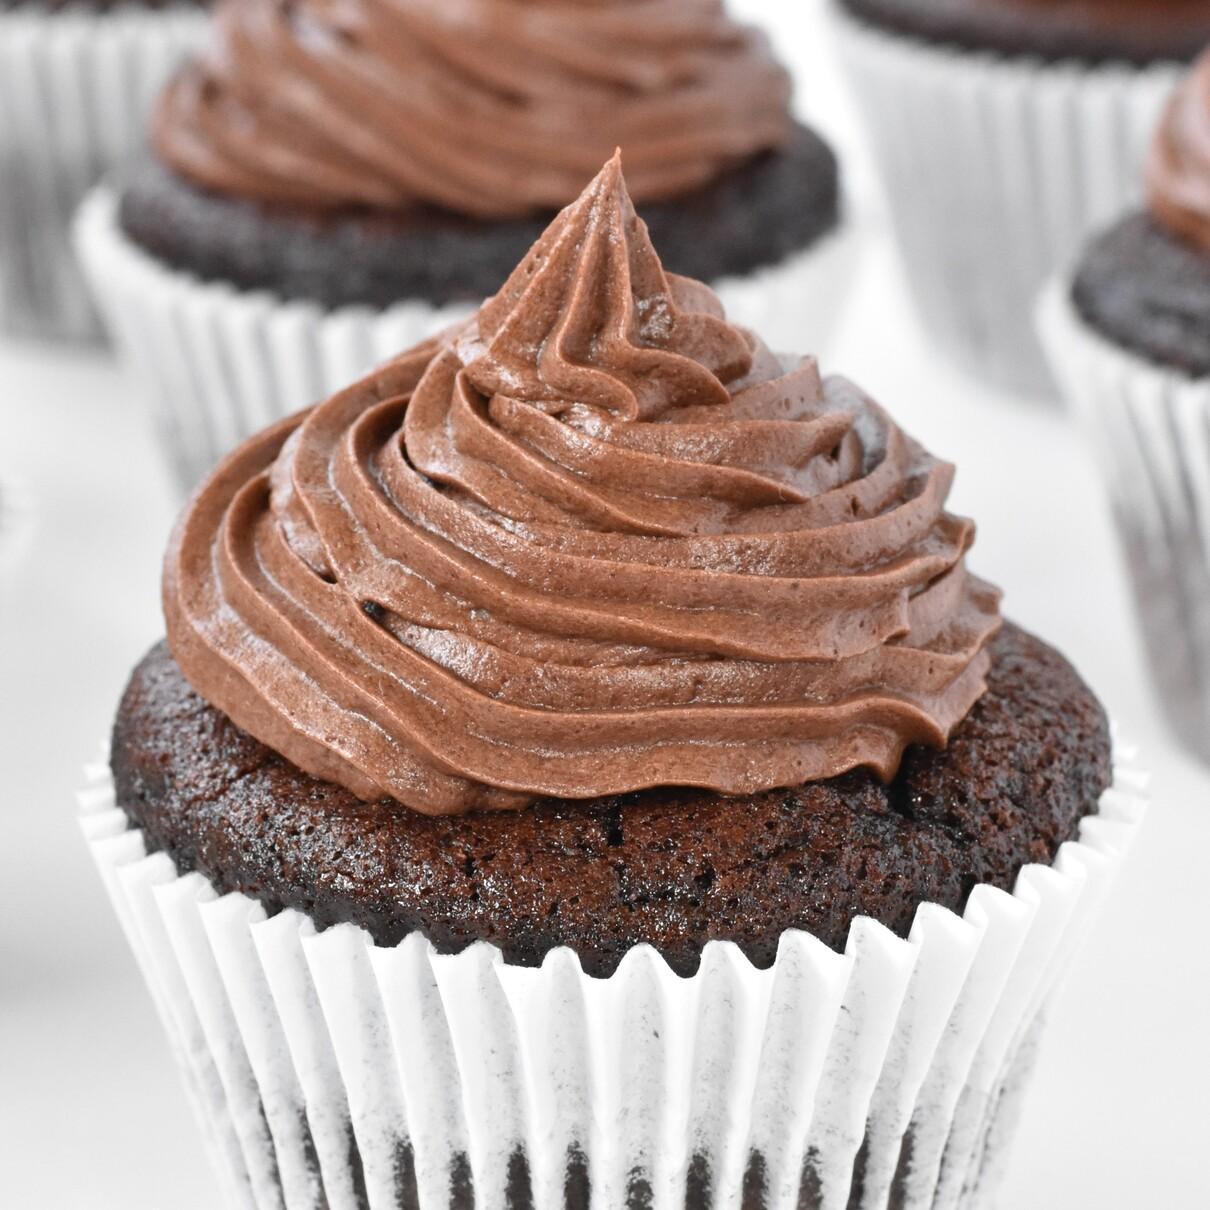 Chocolate buttercream on chocolate cupcake